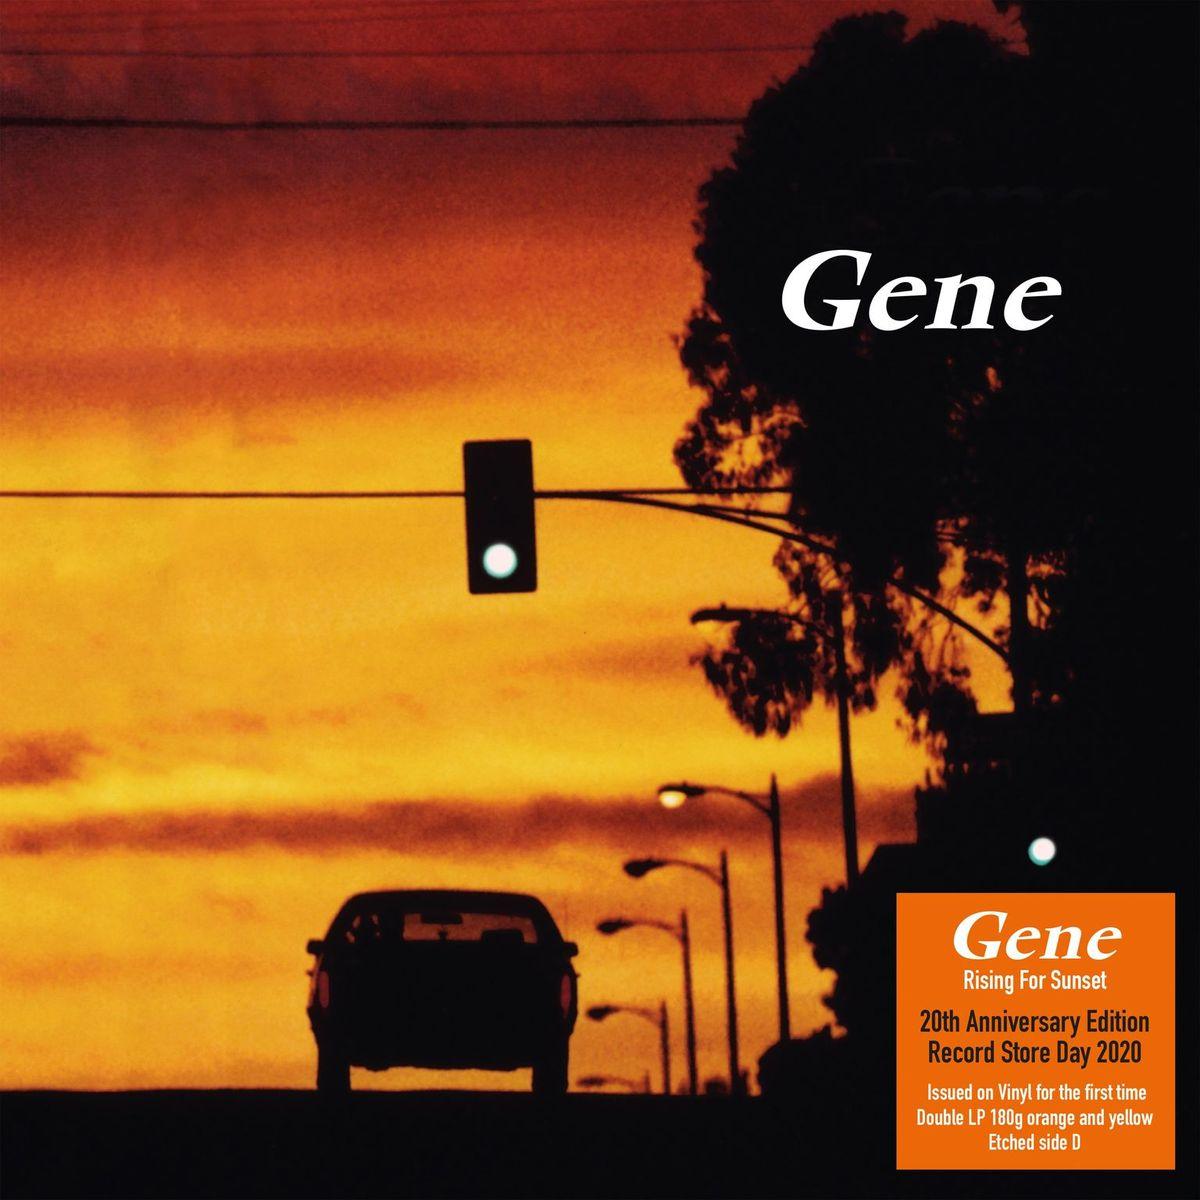 Gene - Rising For Sunset - 20th Anniversary Edition